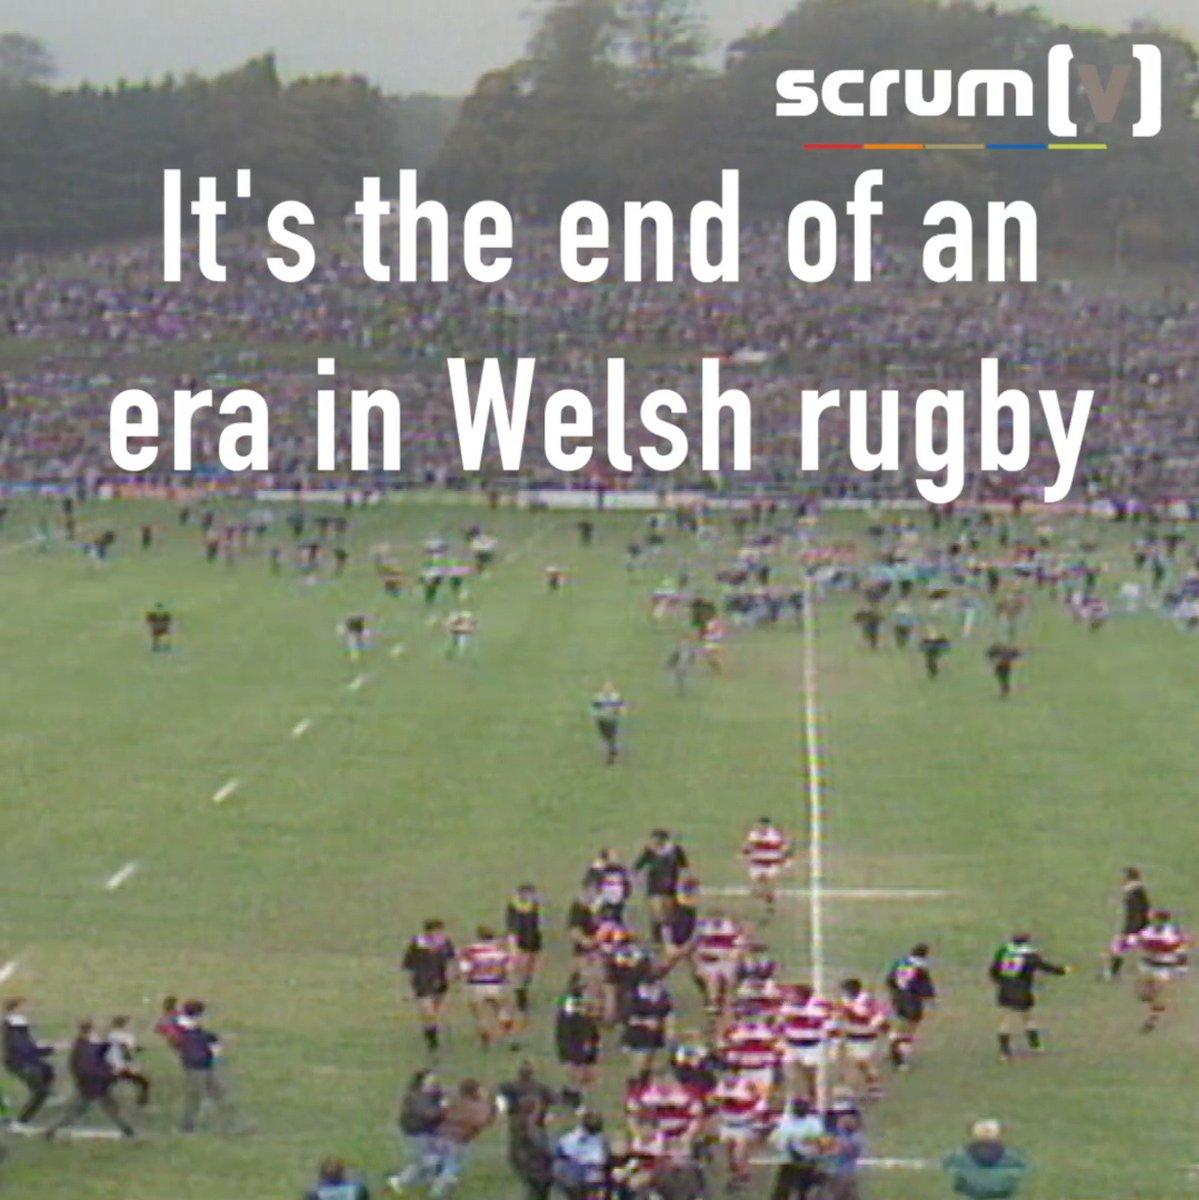 BBC ScrumV's photo on Rugby